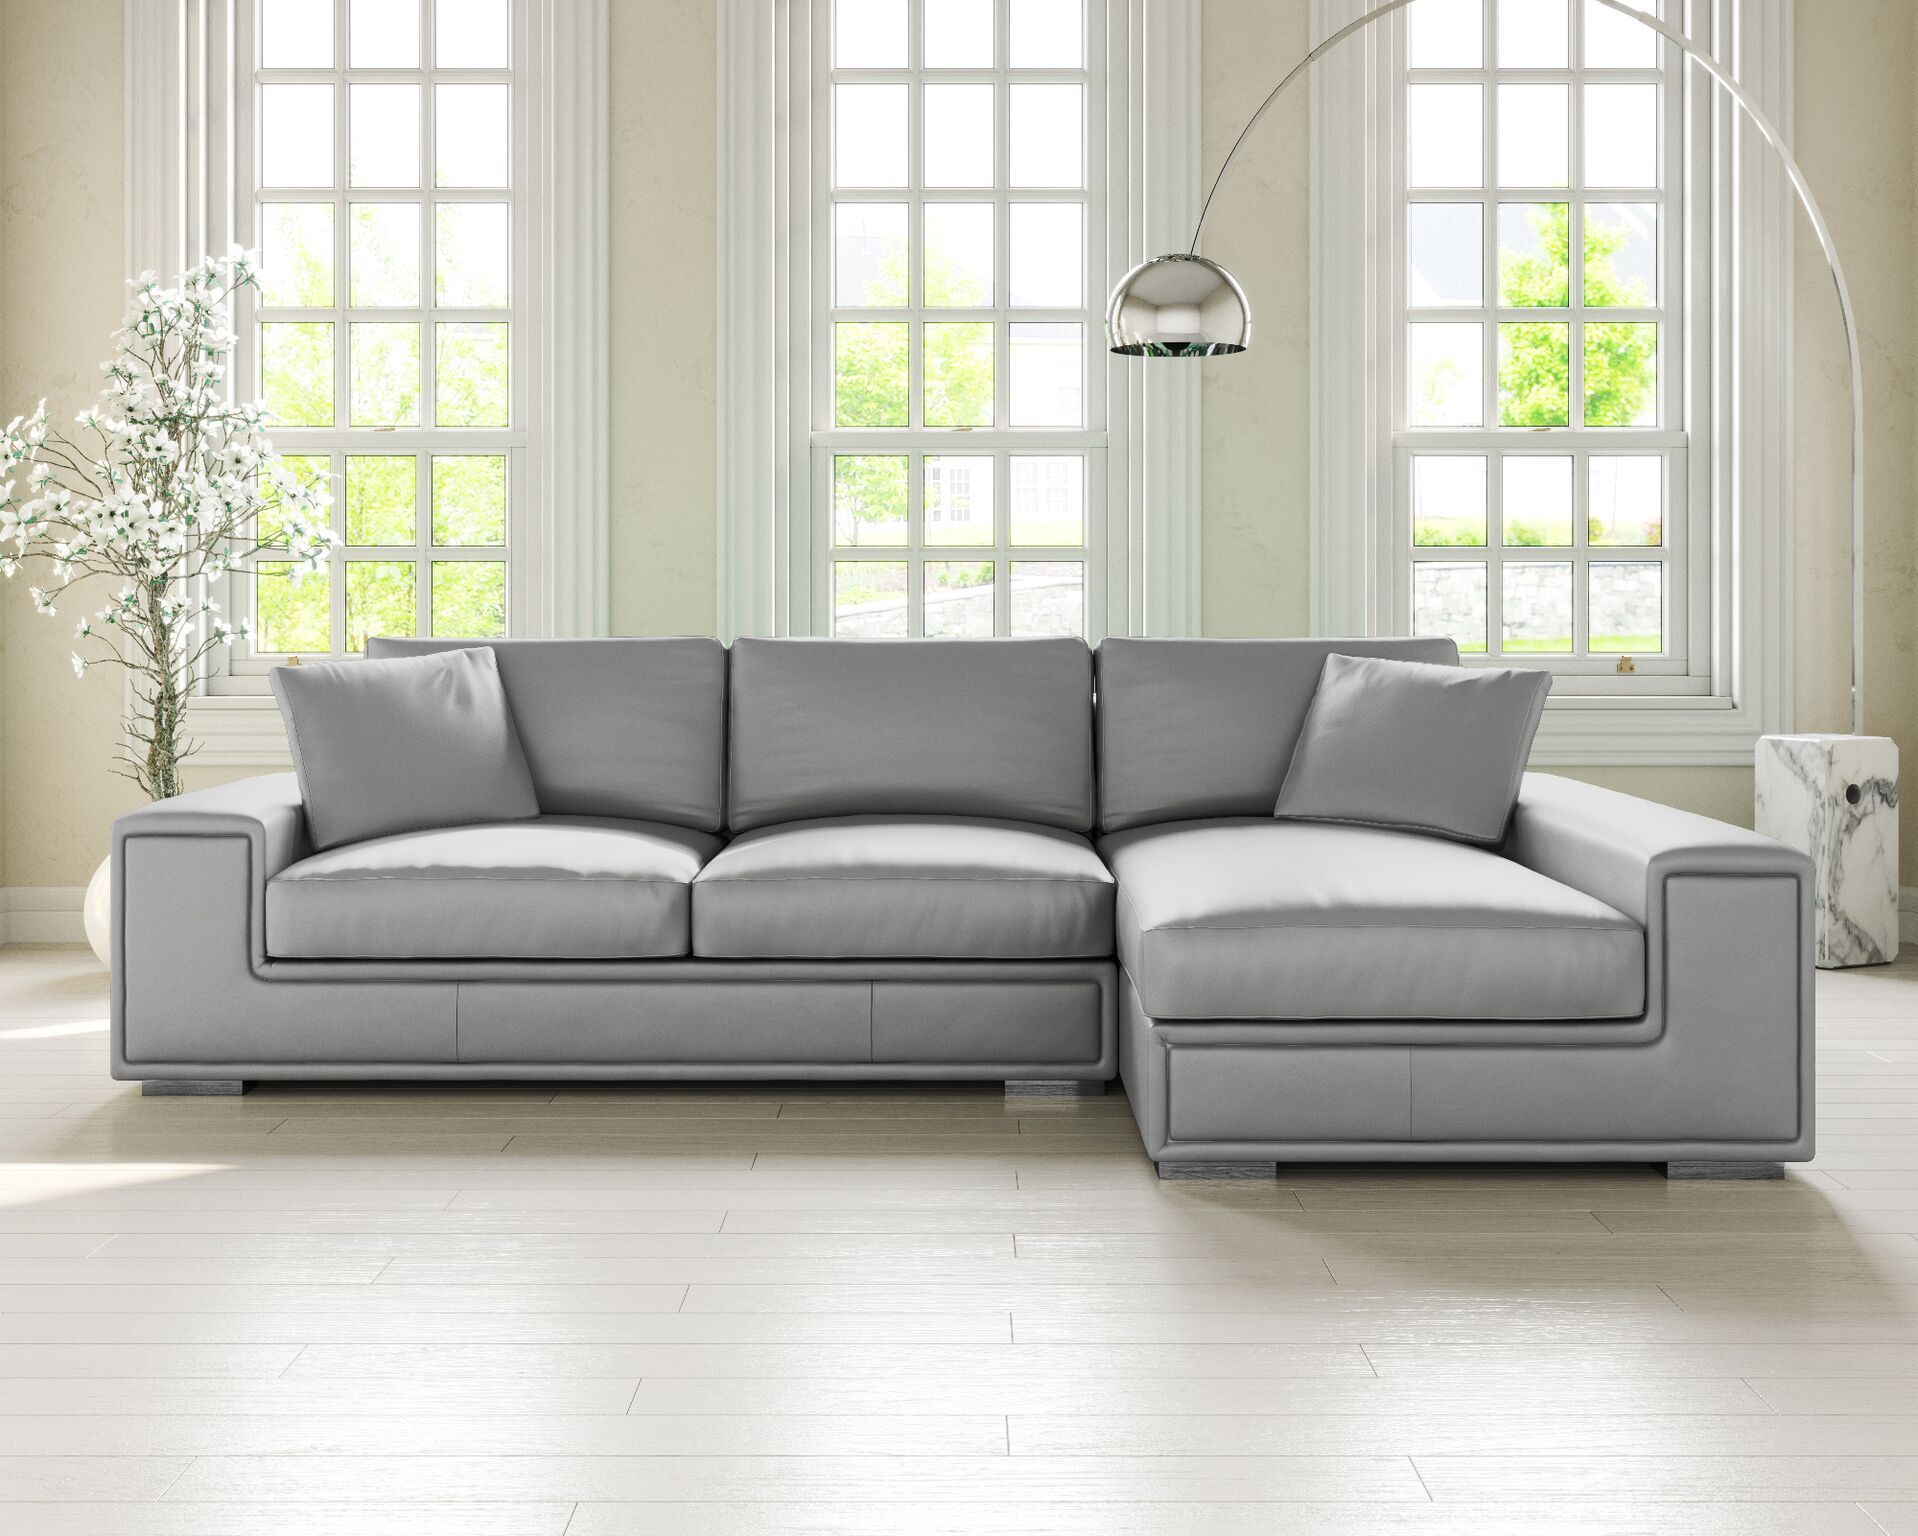 The Lupo Leather Corner Sofa Is A Versatile Corner Sofa That Can Fit Into Most Living Rooms Comfortably Elegant Stitch De Leather Corner Sofa Corner Sofa Sofa